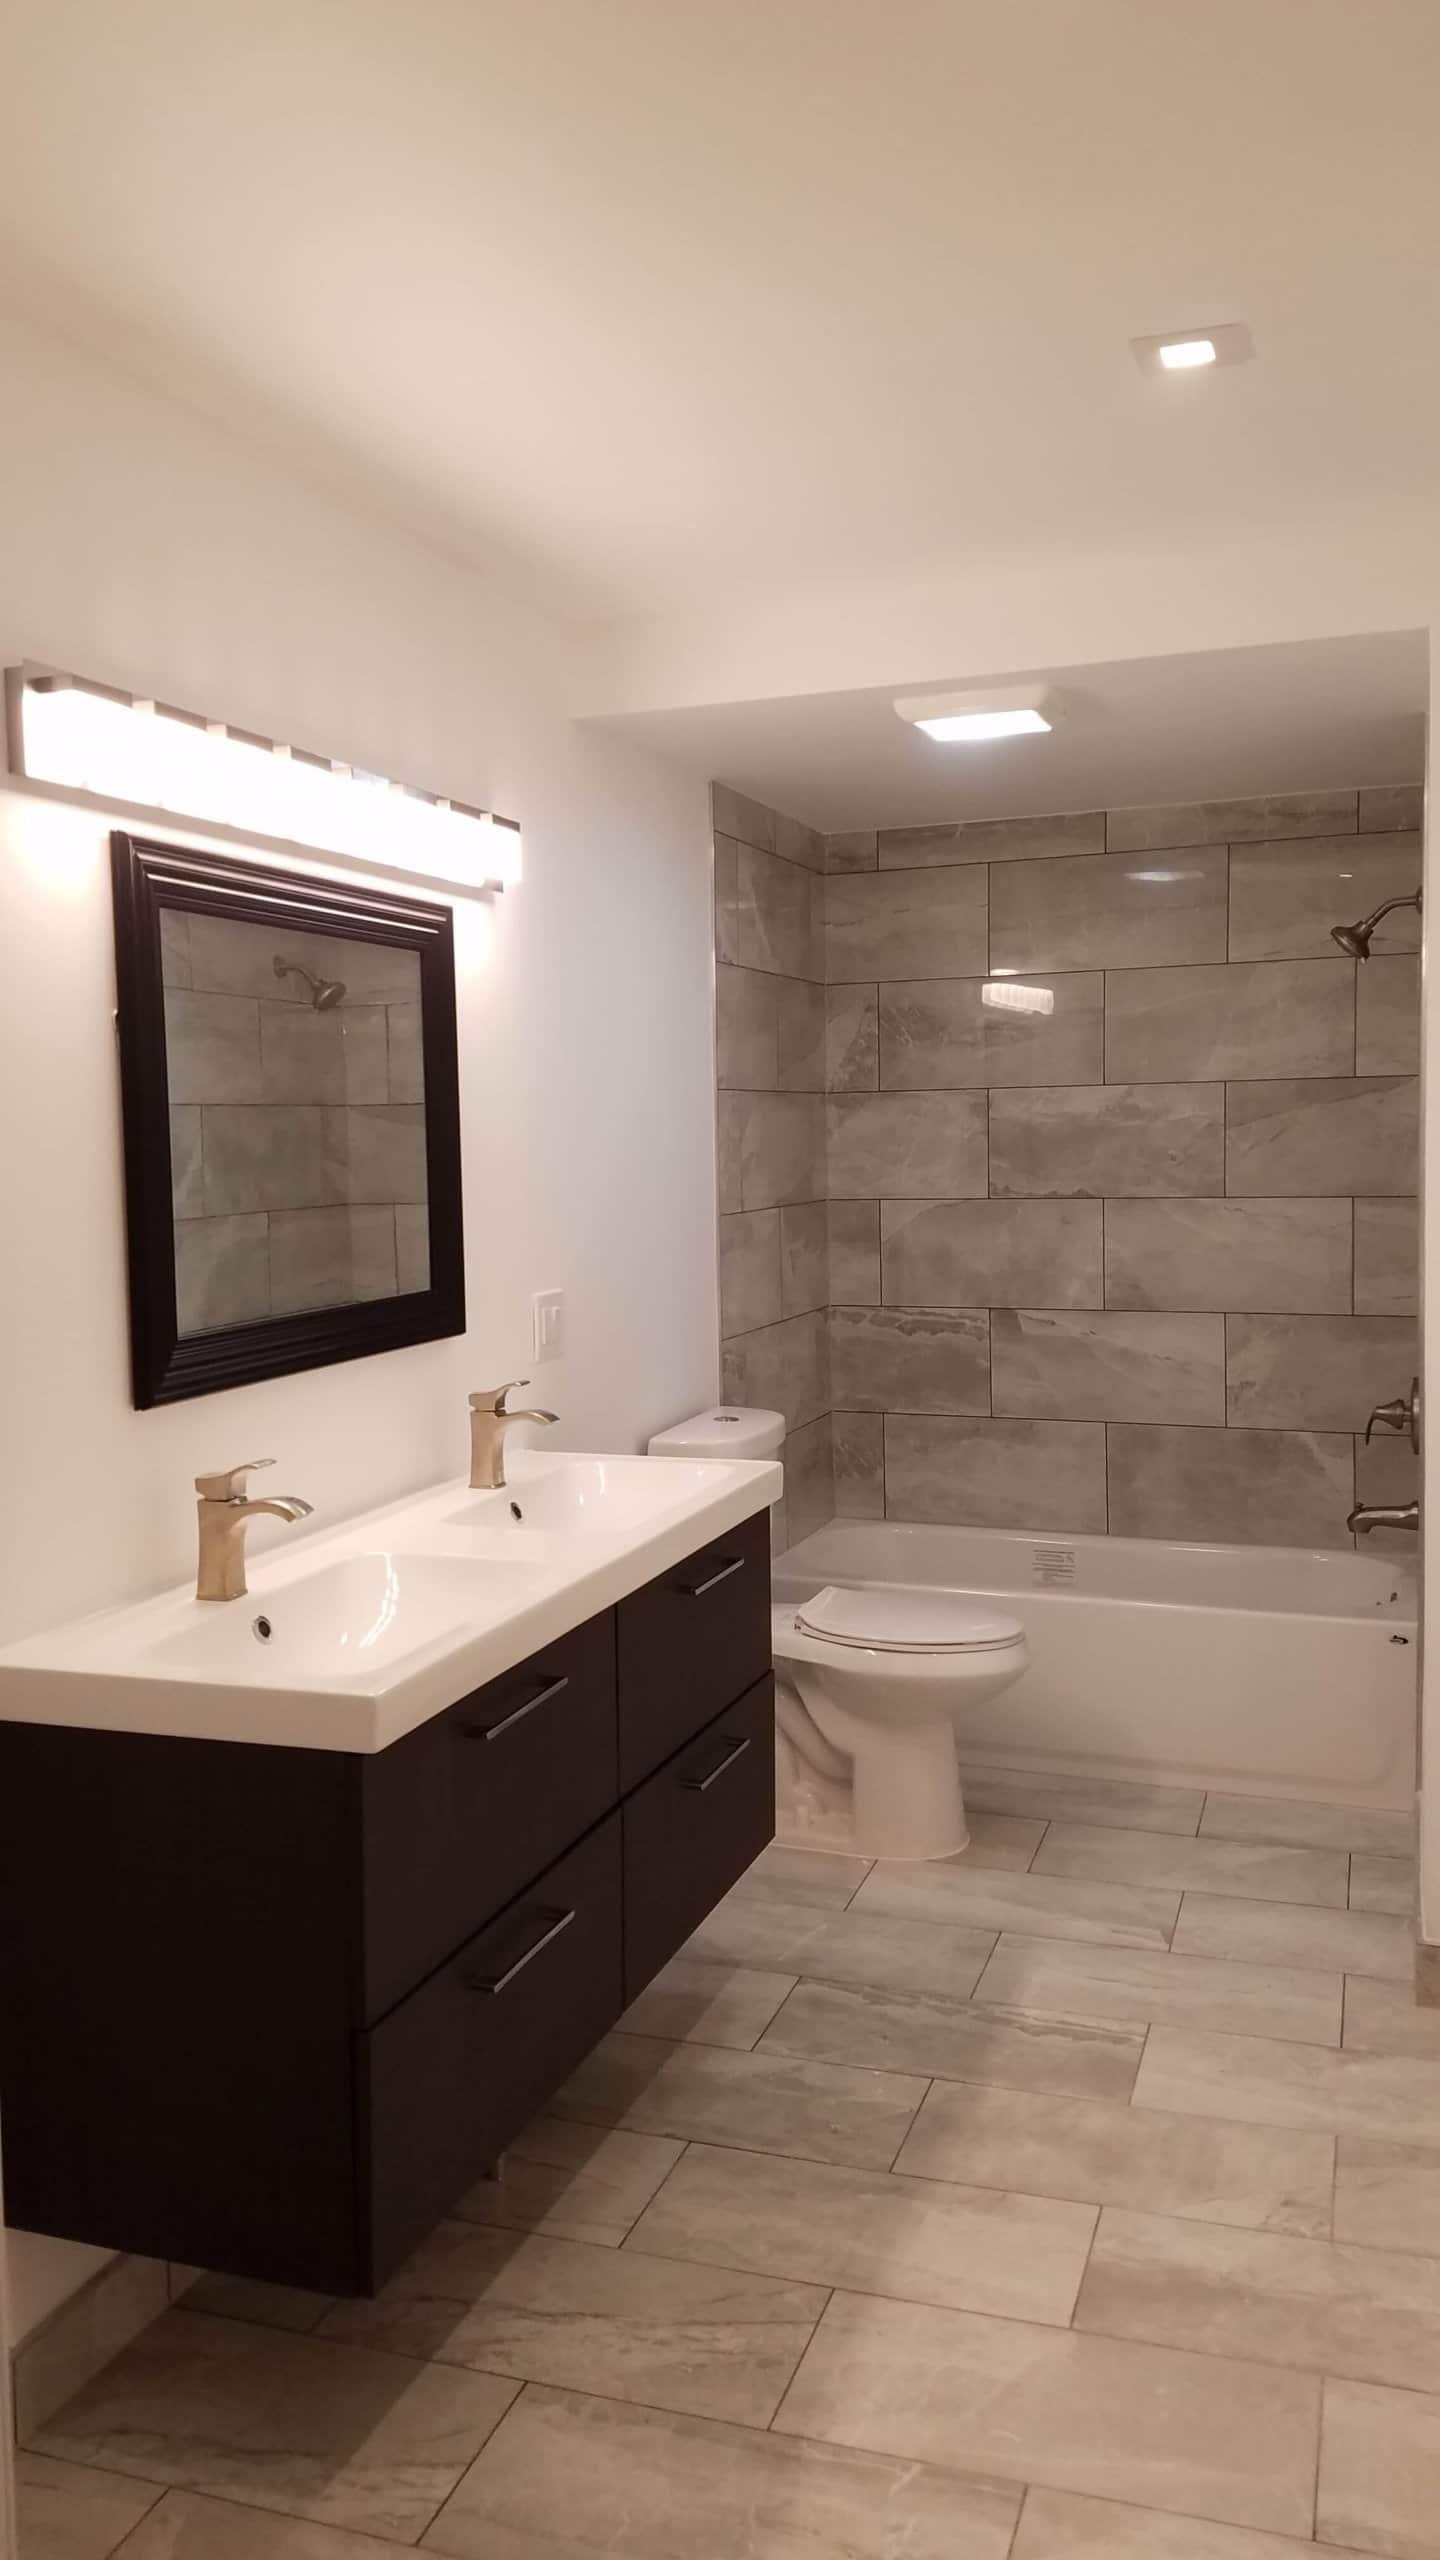 Big tiled Bathroom with Sink